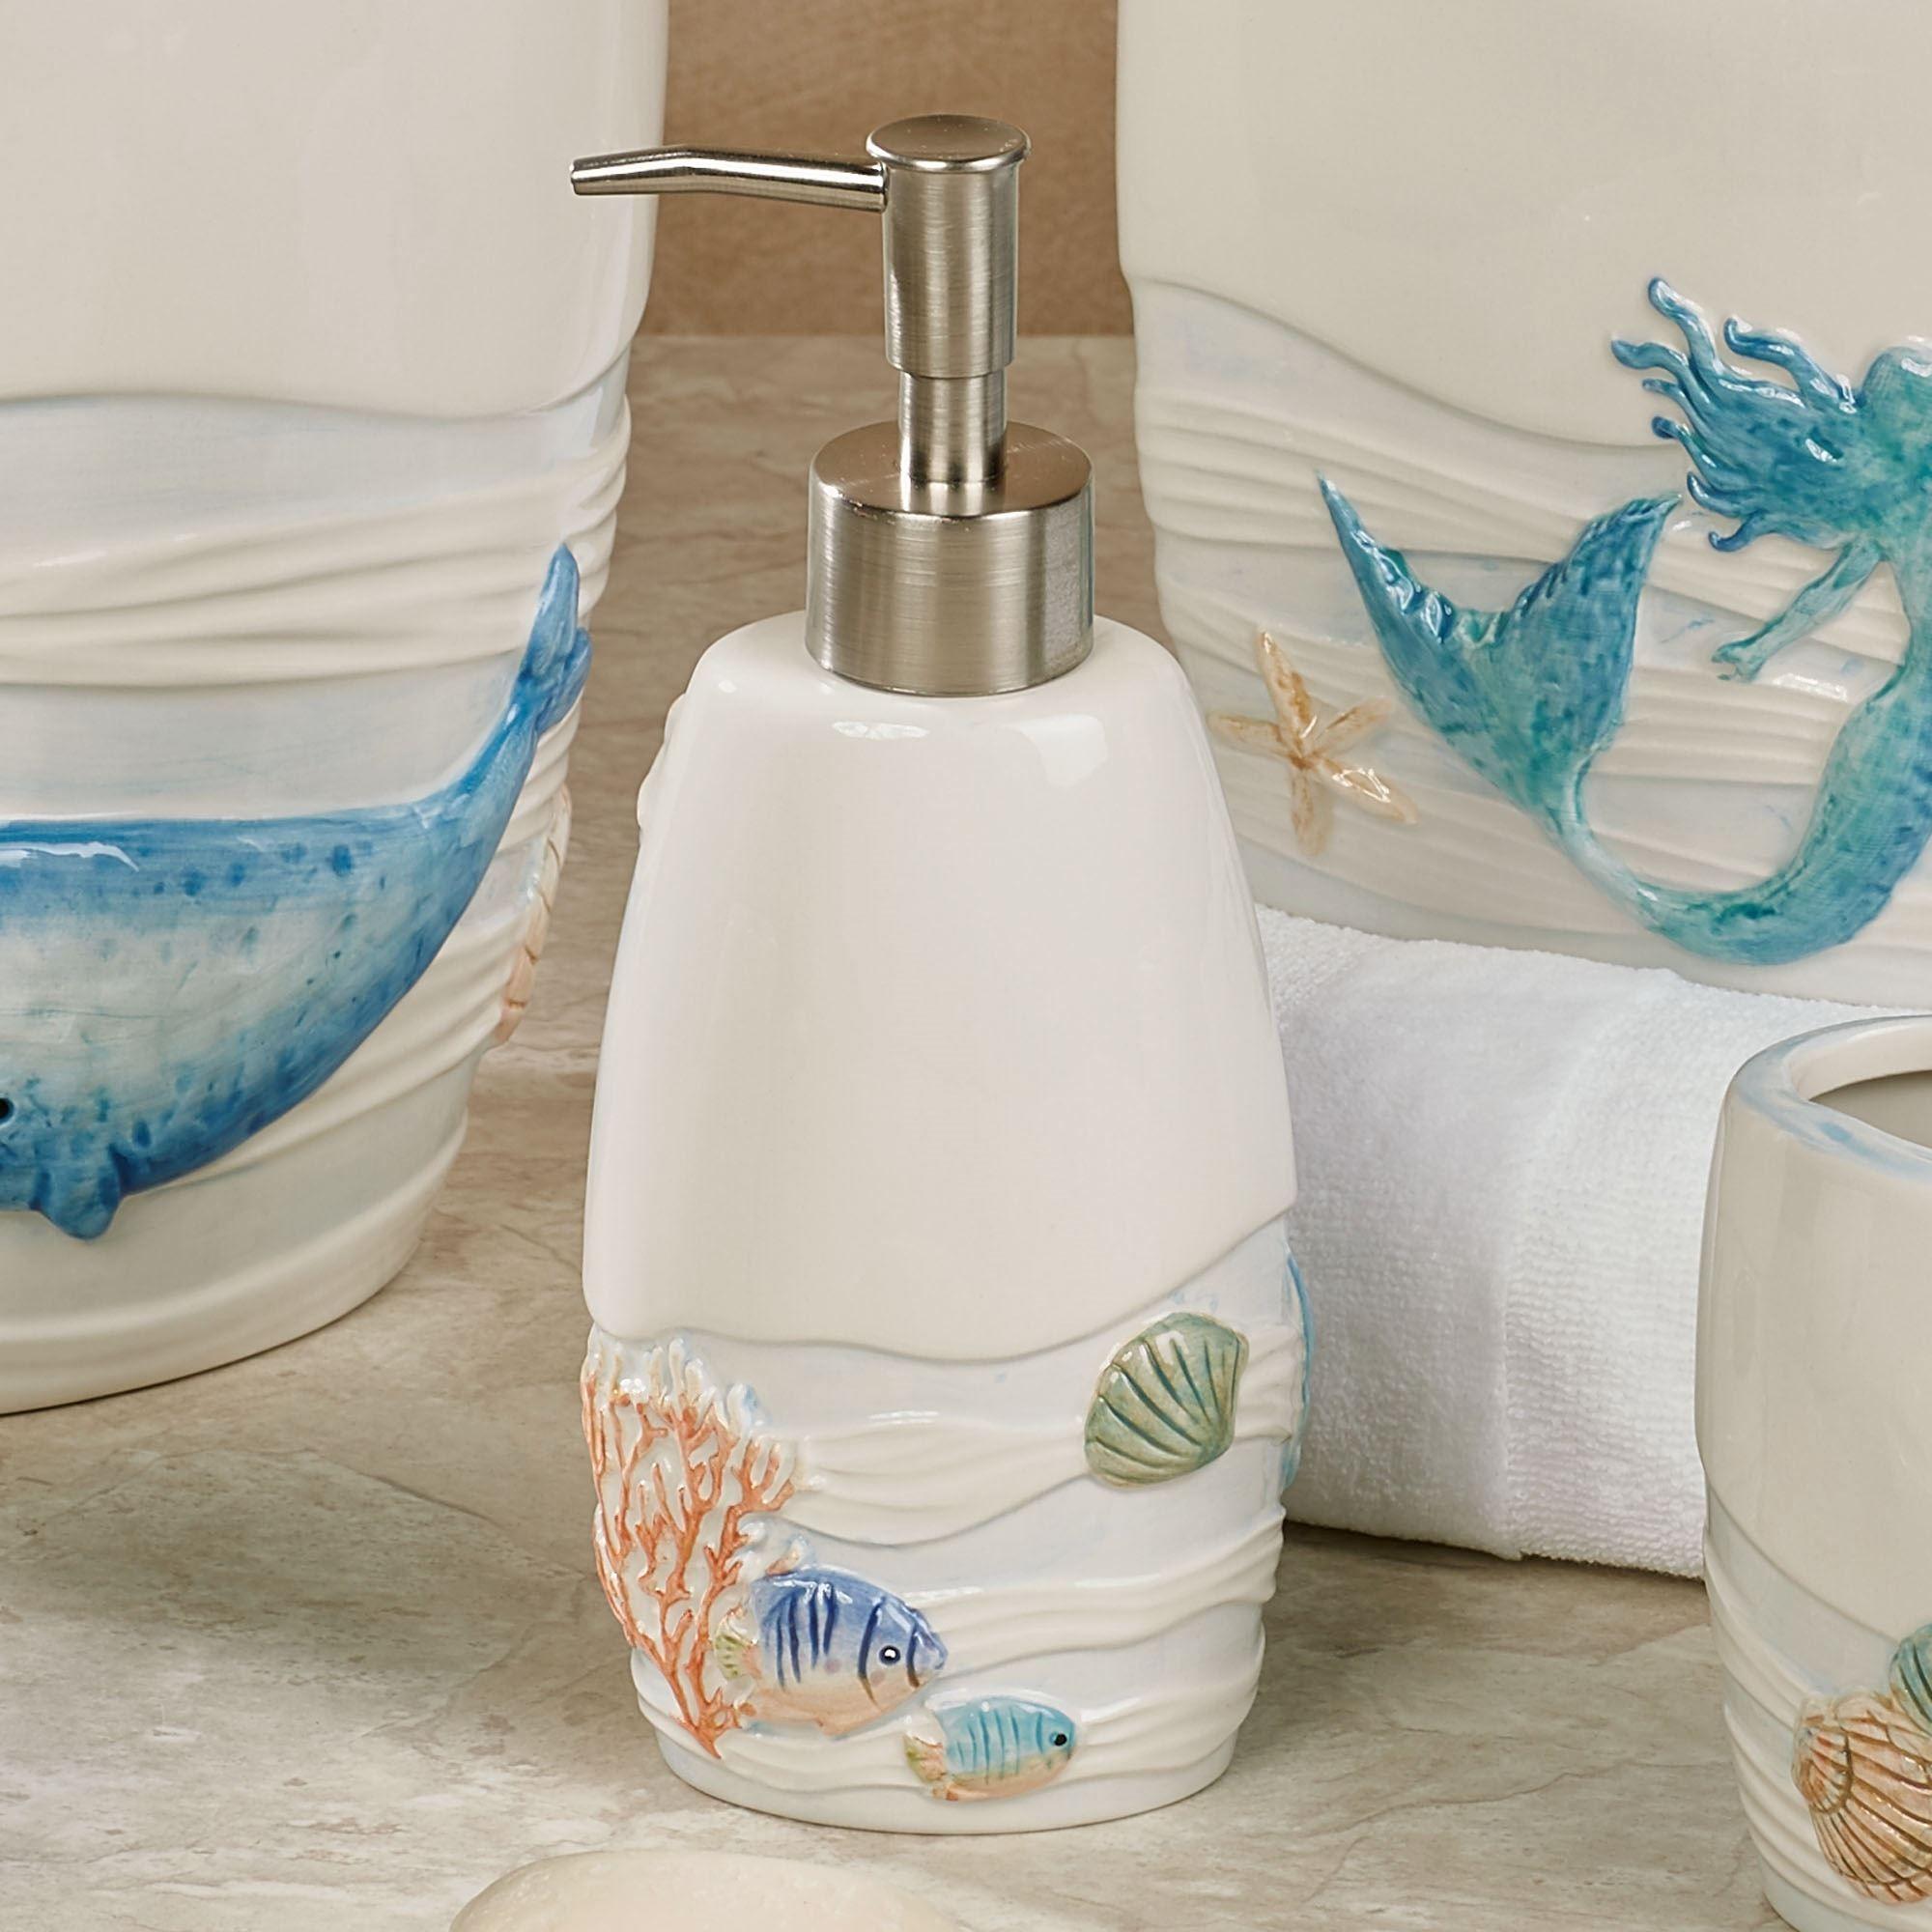 Sea Splash Ocean Themed Bath Accessories